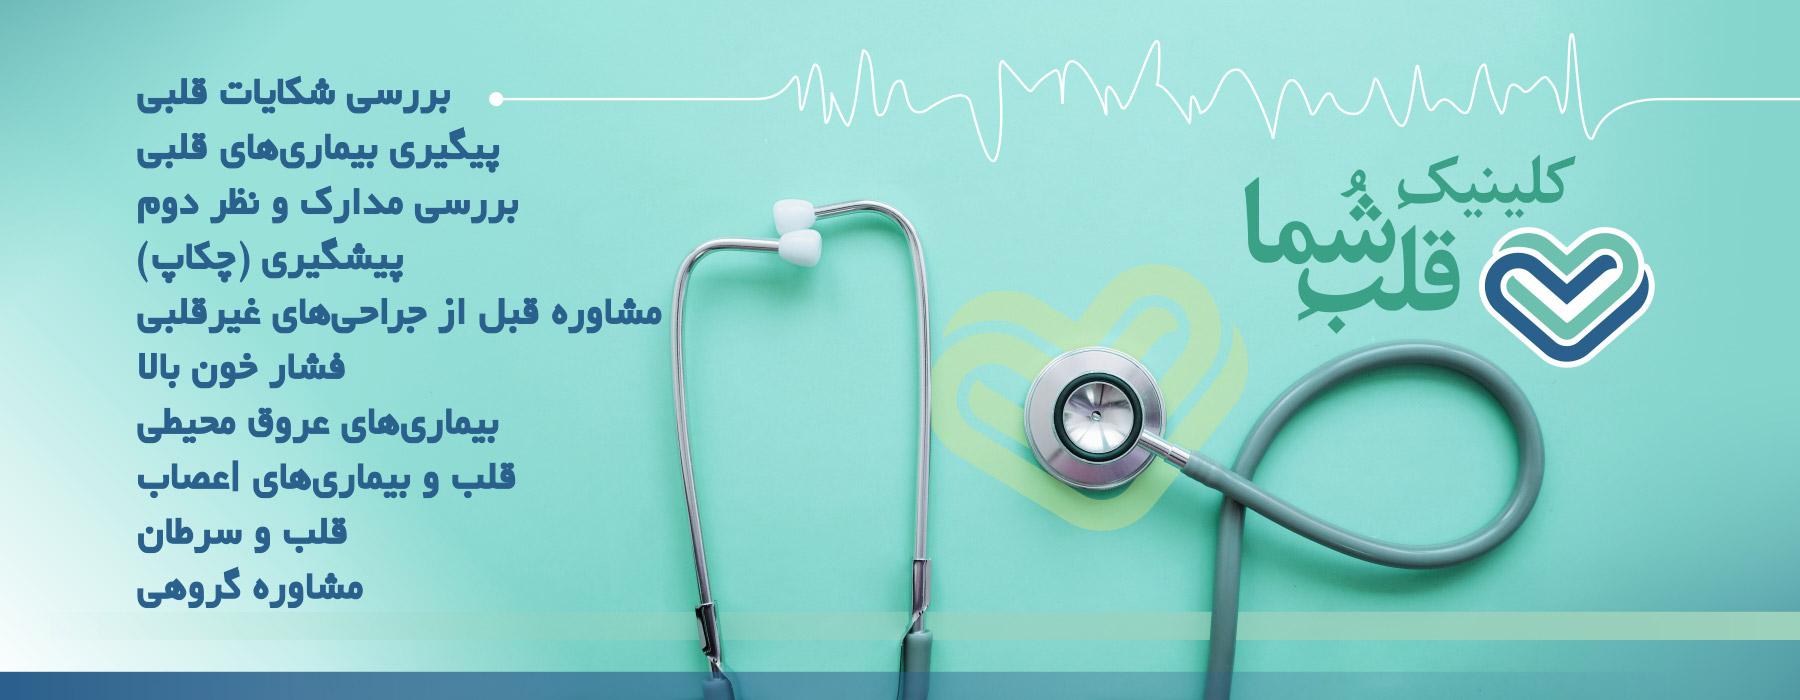 خدمات کلینیک قلب